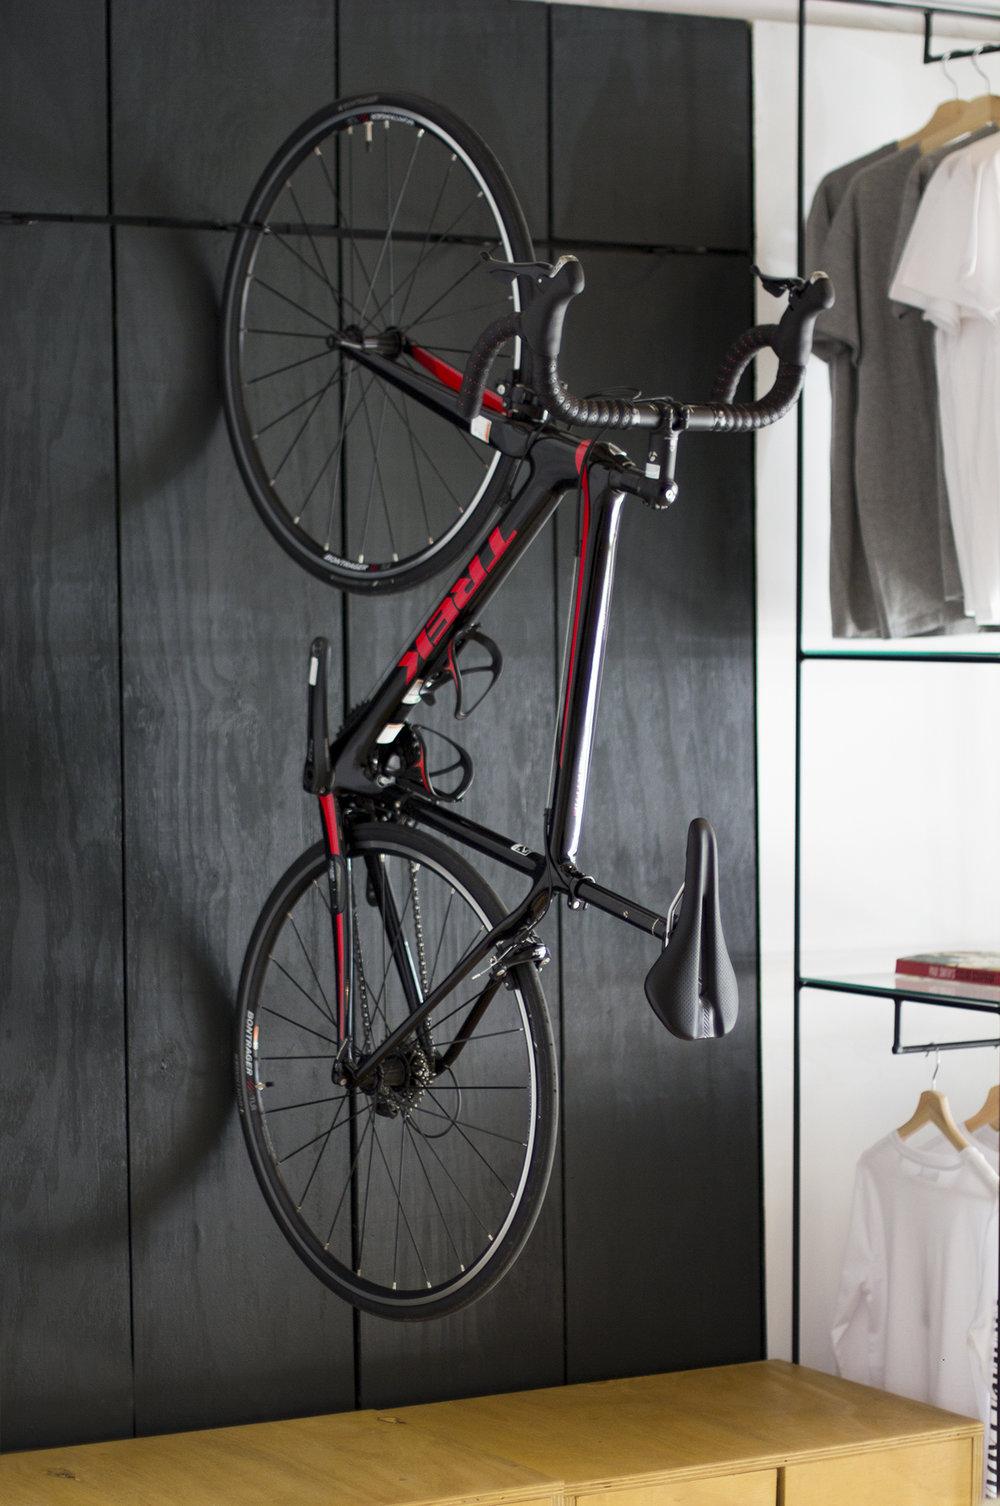 Tienda_alquiler_bicicleta_carbono_malaga